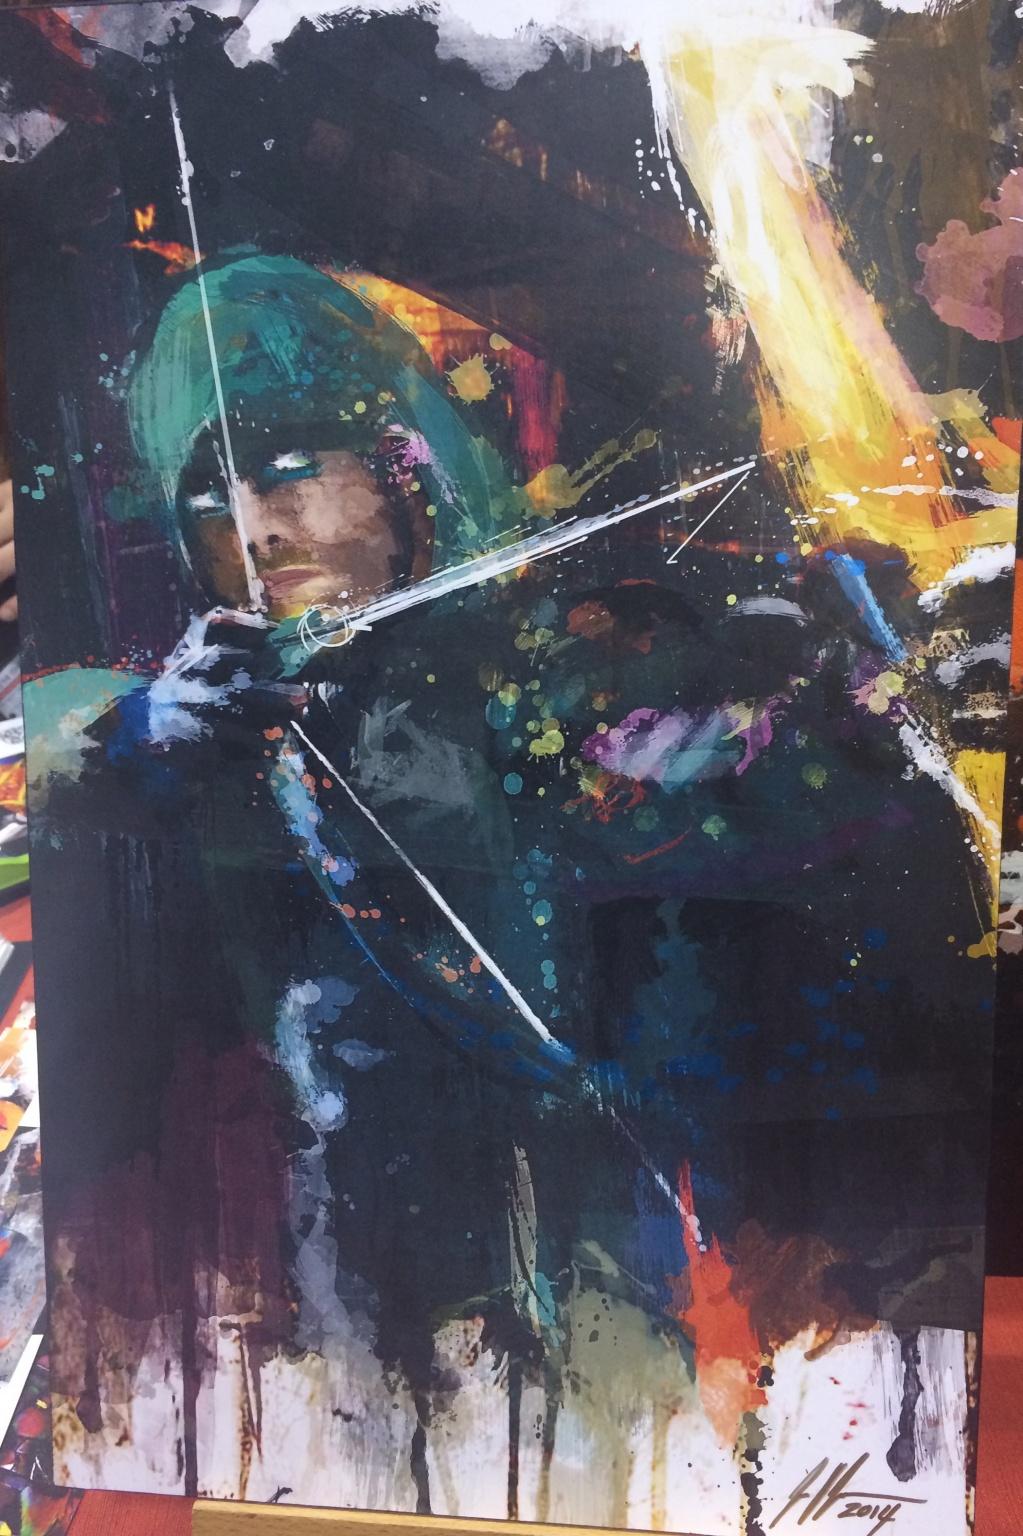 Holy <em>Arrow</em> on canvas, Batman